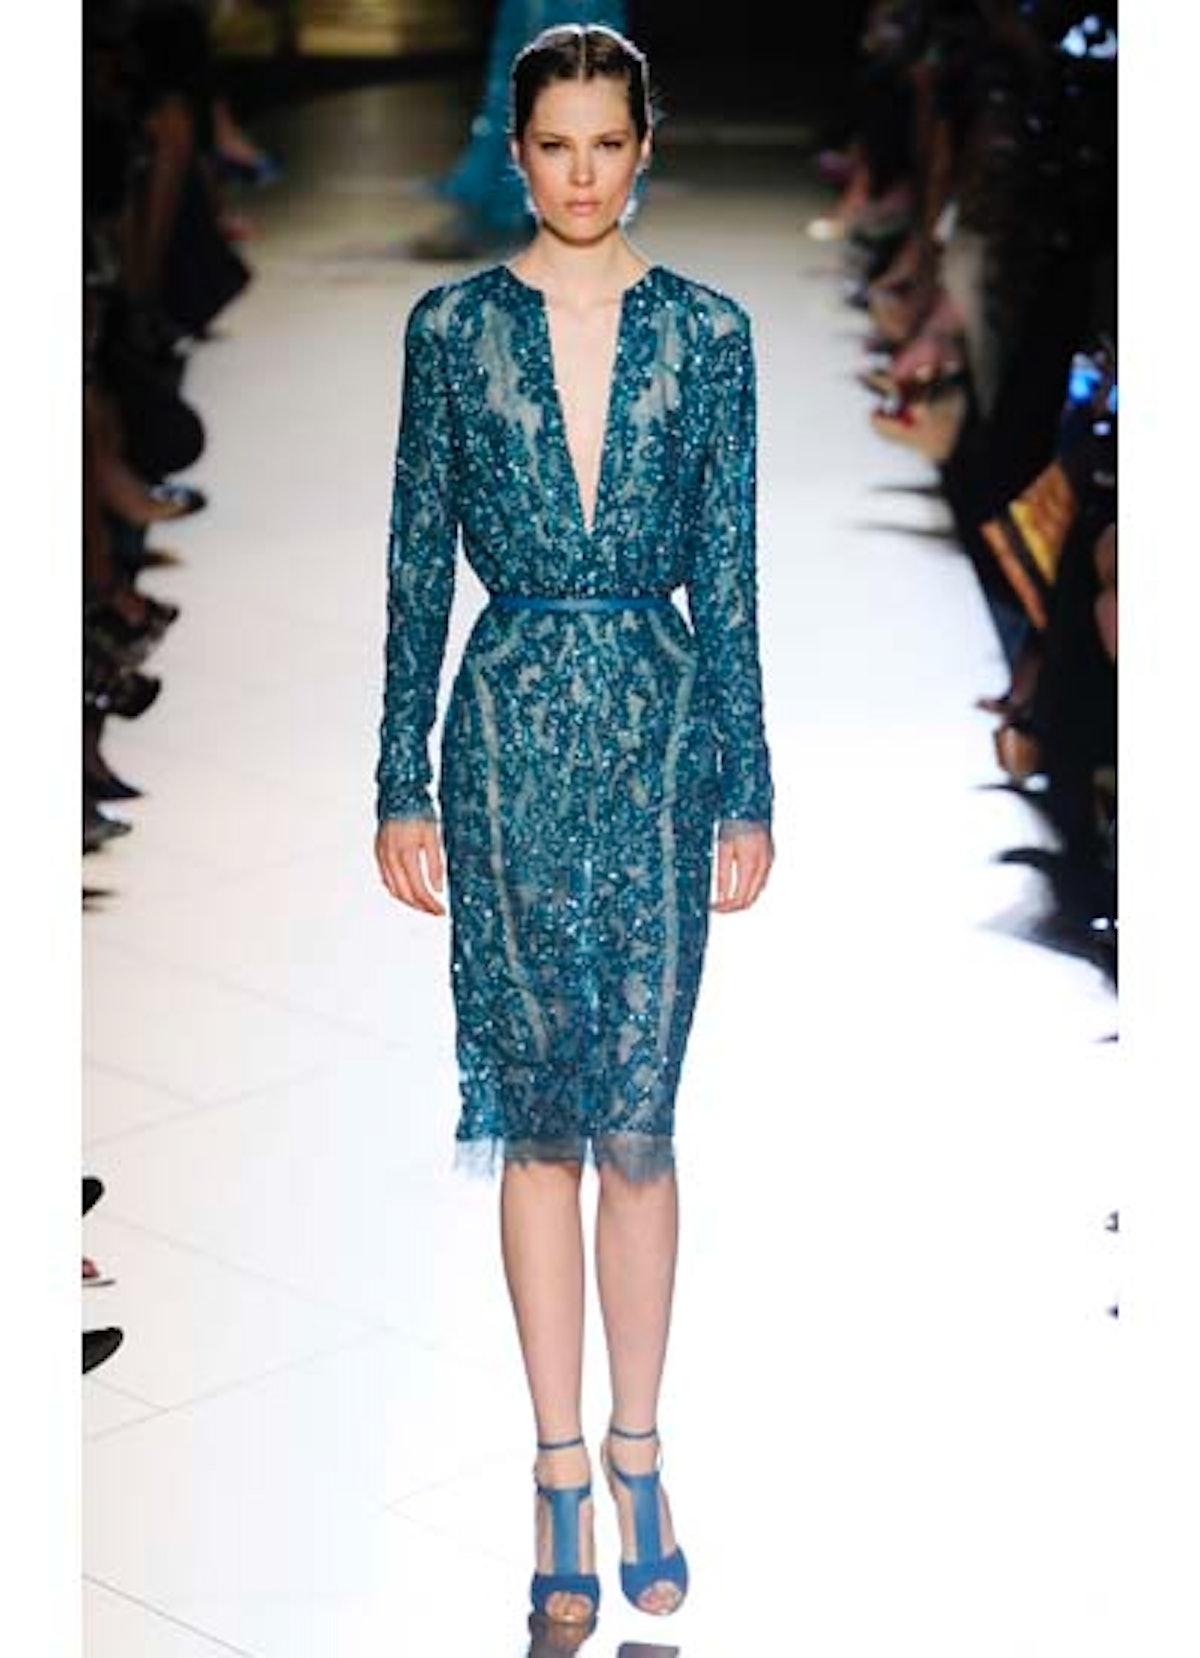 fass-elie-saab-couture-2012-runway-28-v.jpg